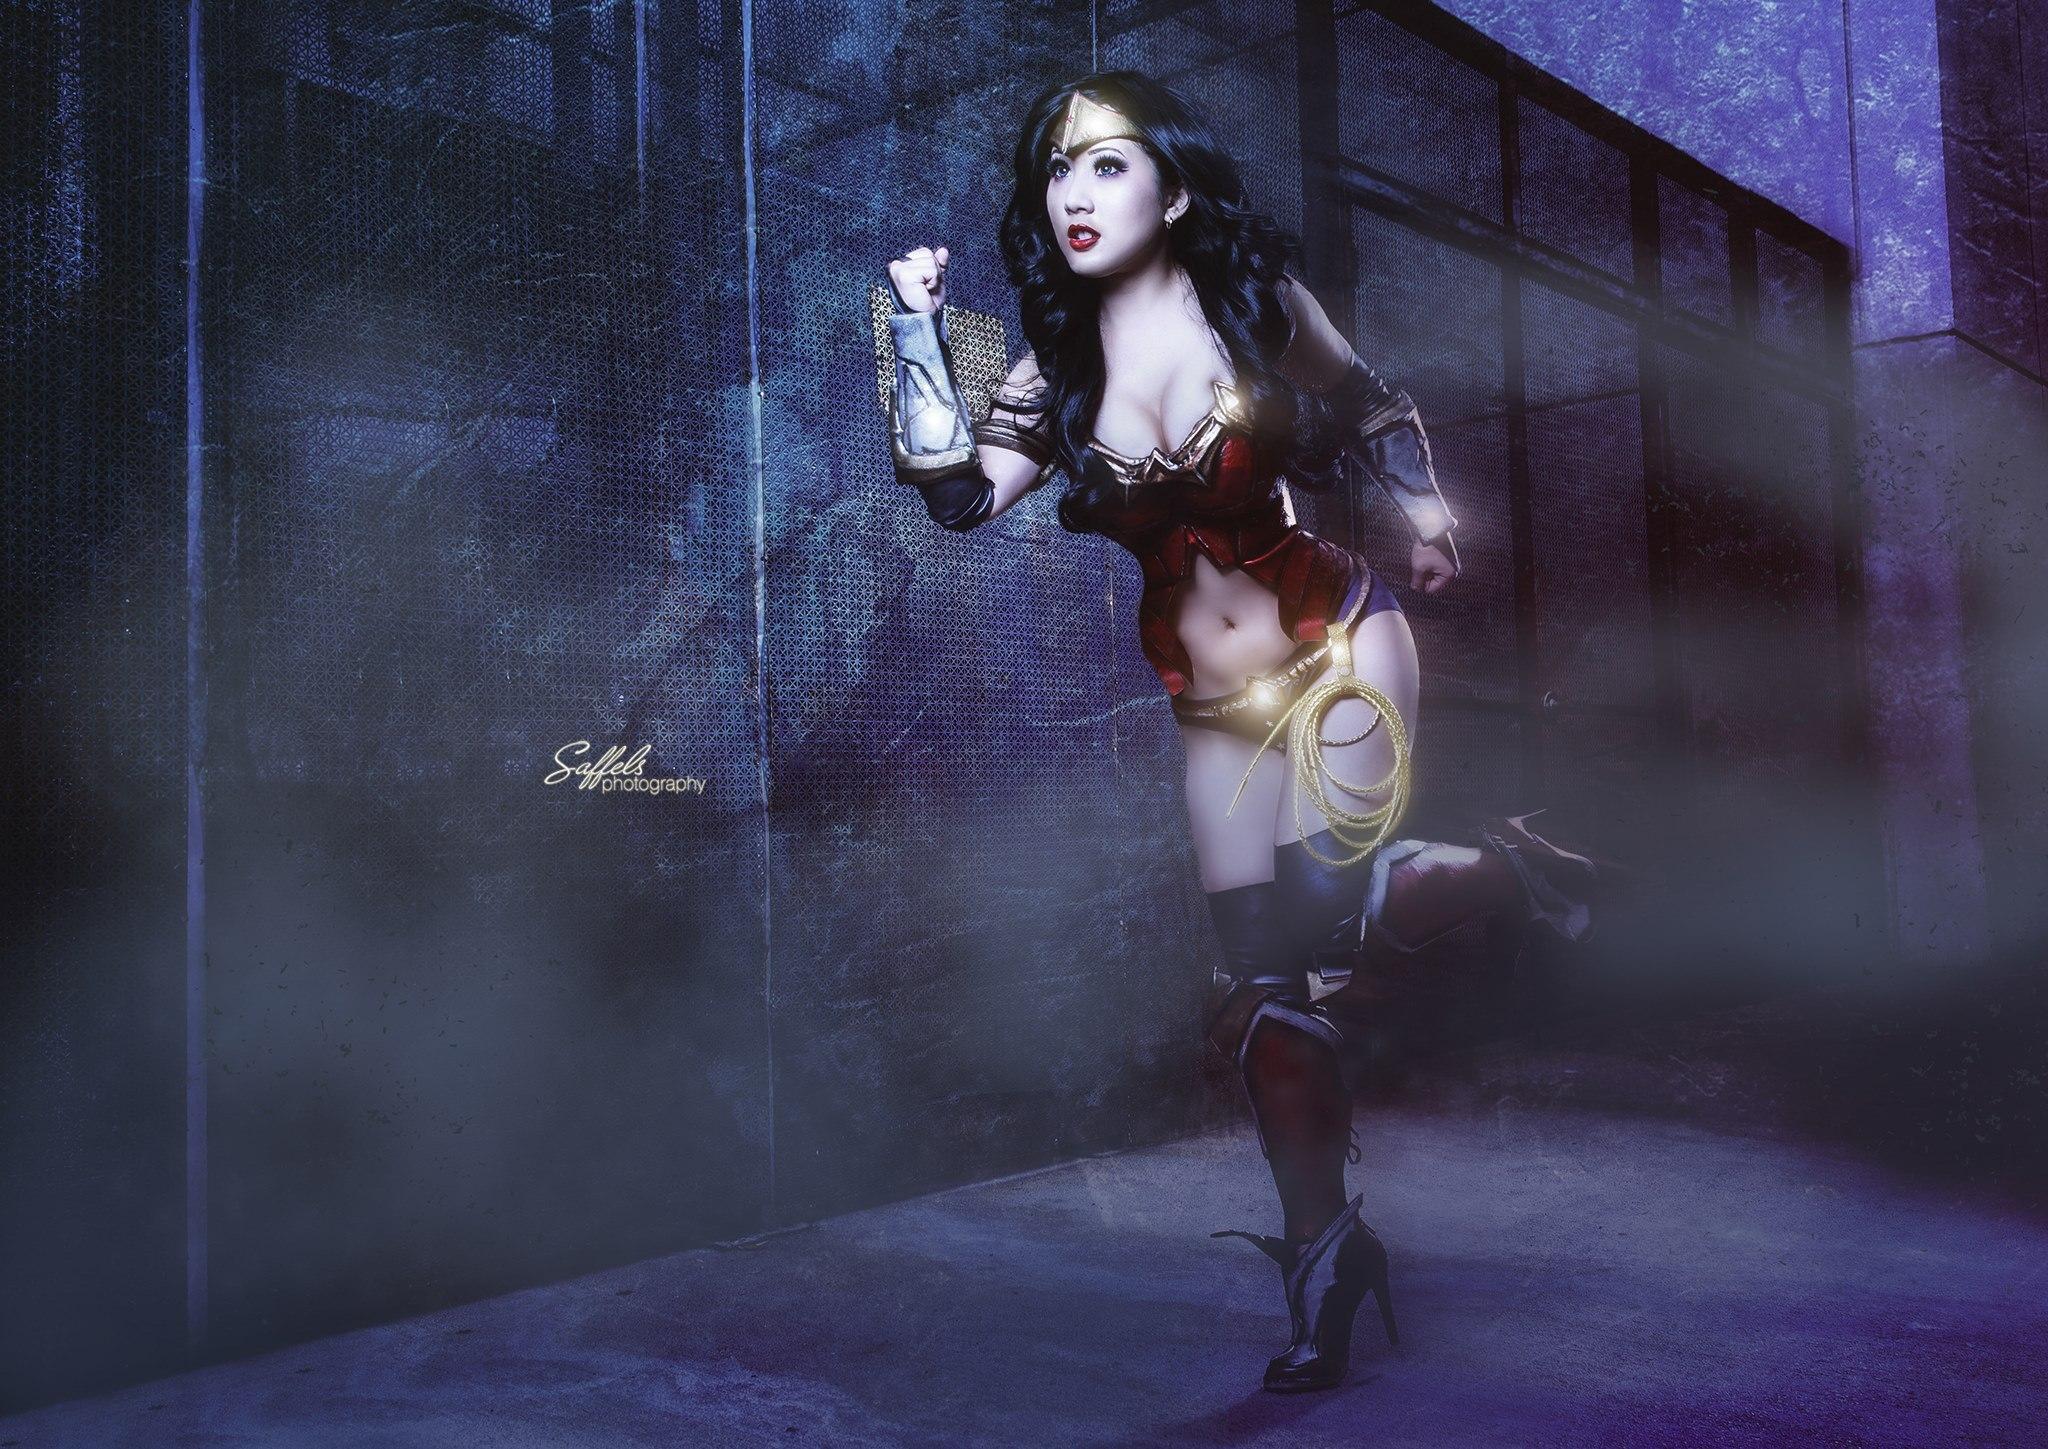 Play Arts Kai Wonder Woman